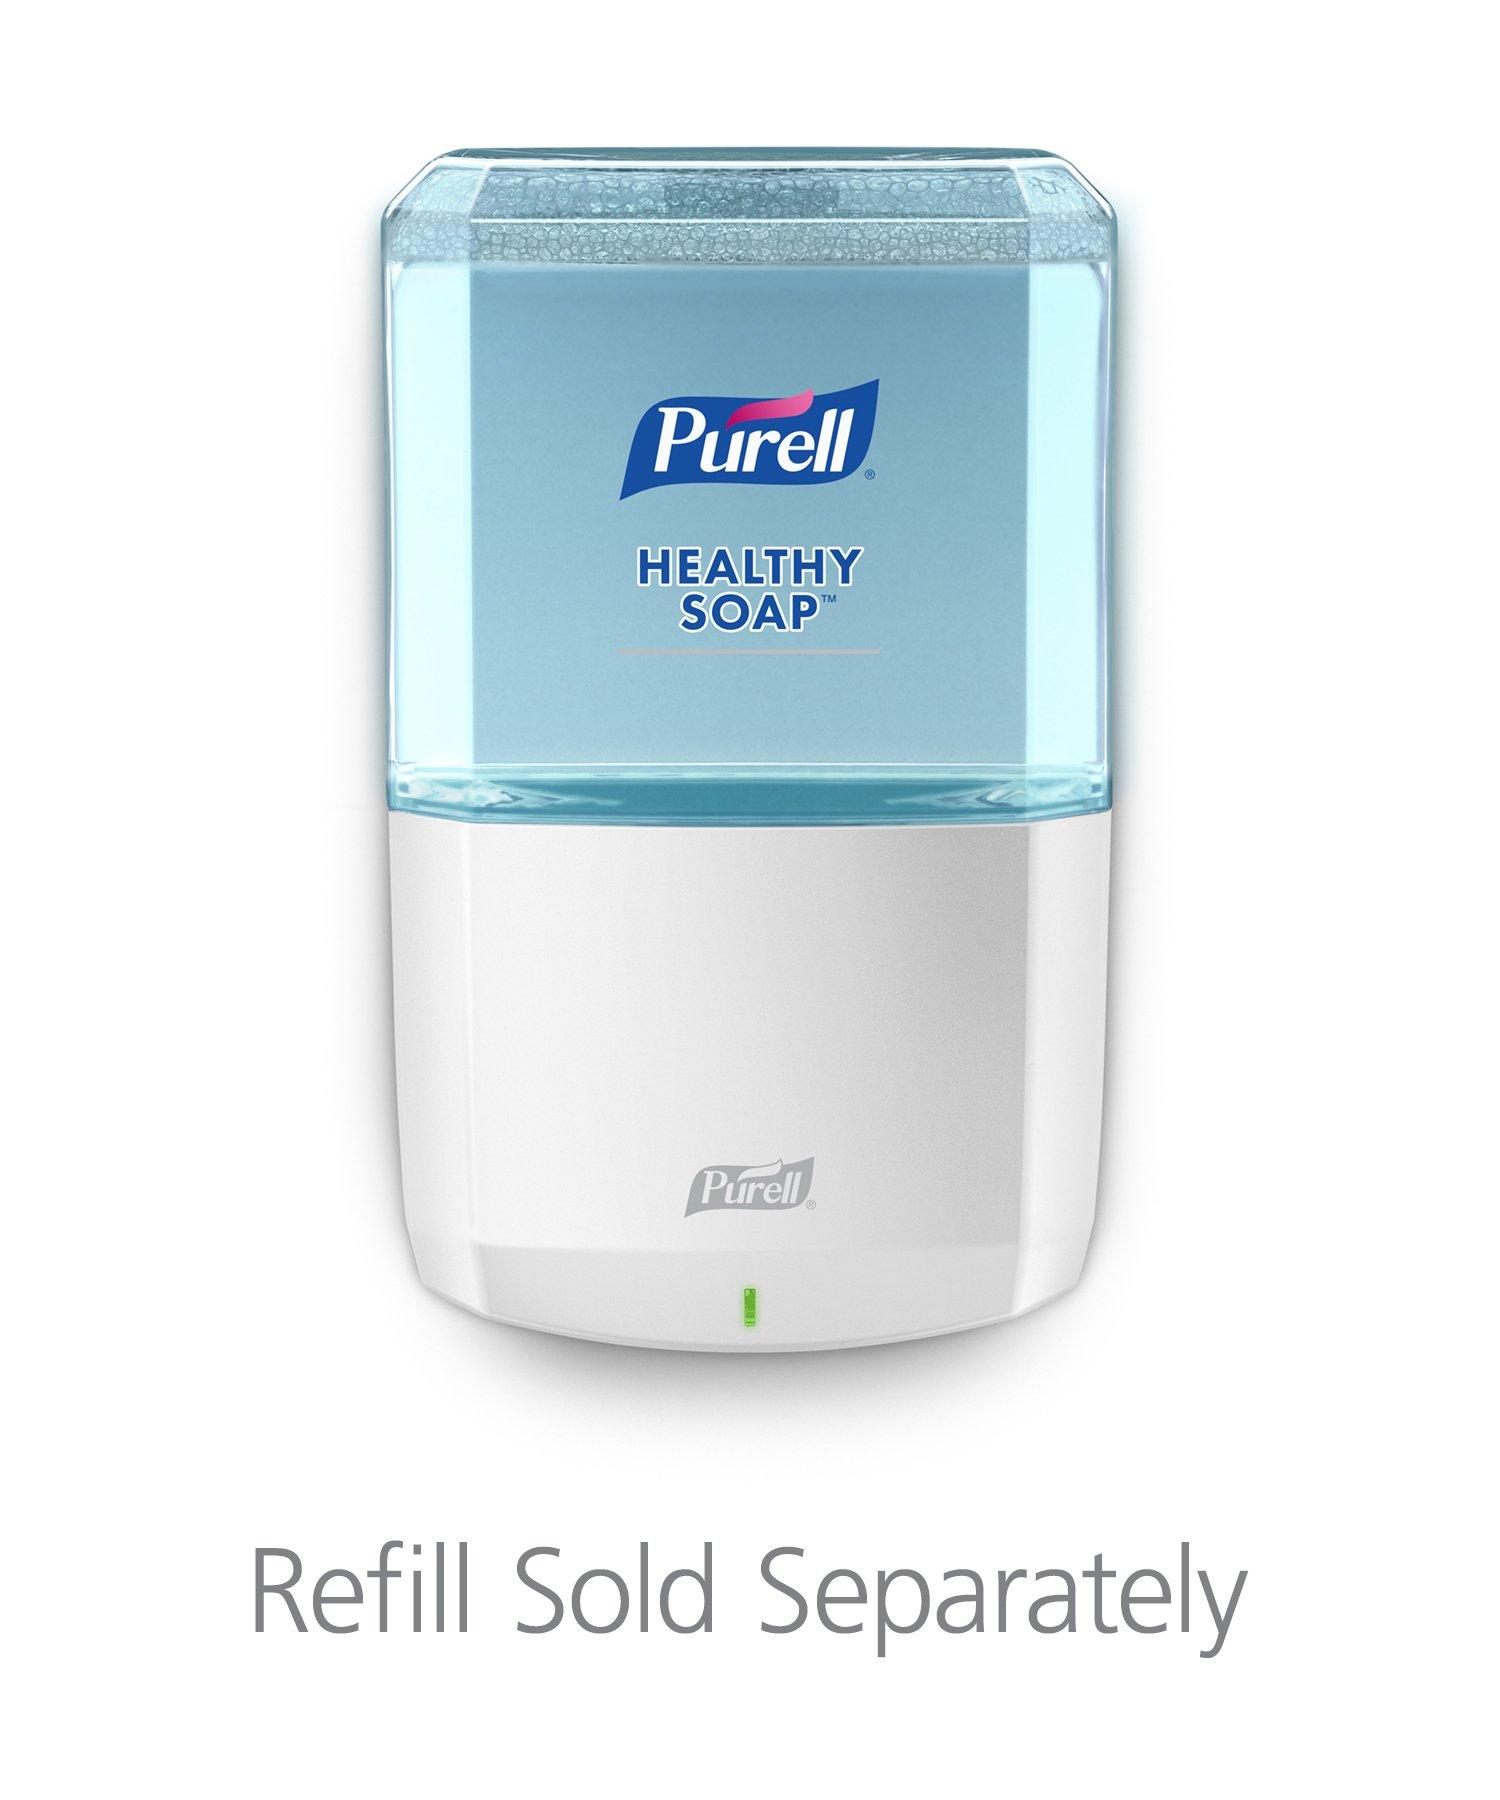 PURELL Healthy SOAP ES8 Dispenser, White, Dispenser for ES8 1200mL Refills - 7730-01